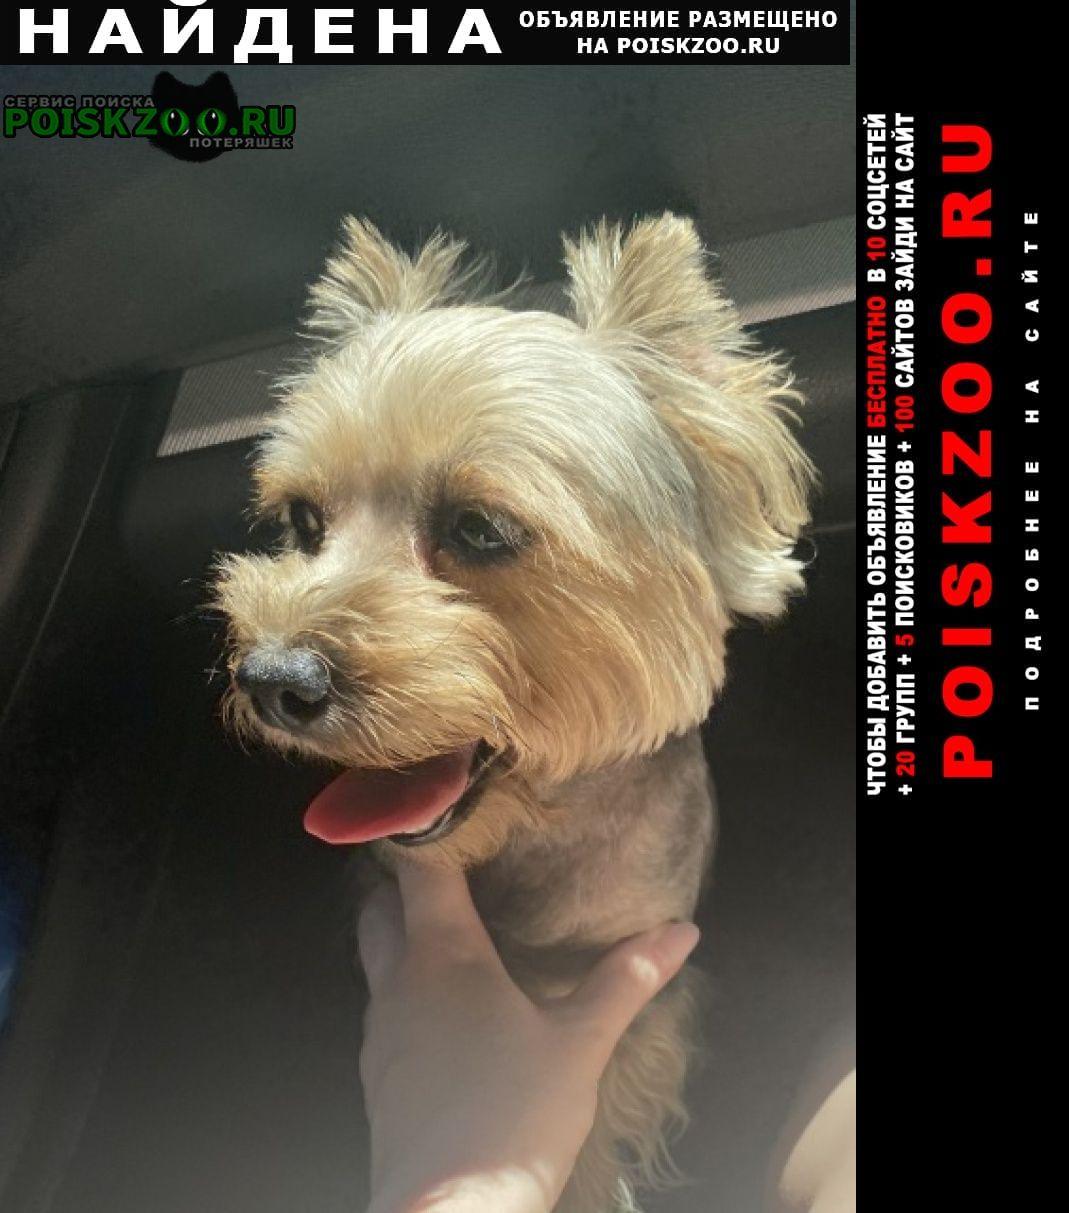 Найдена собака йорк Керчь